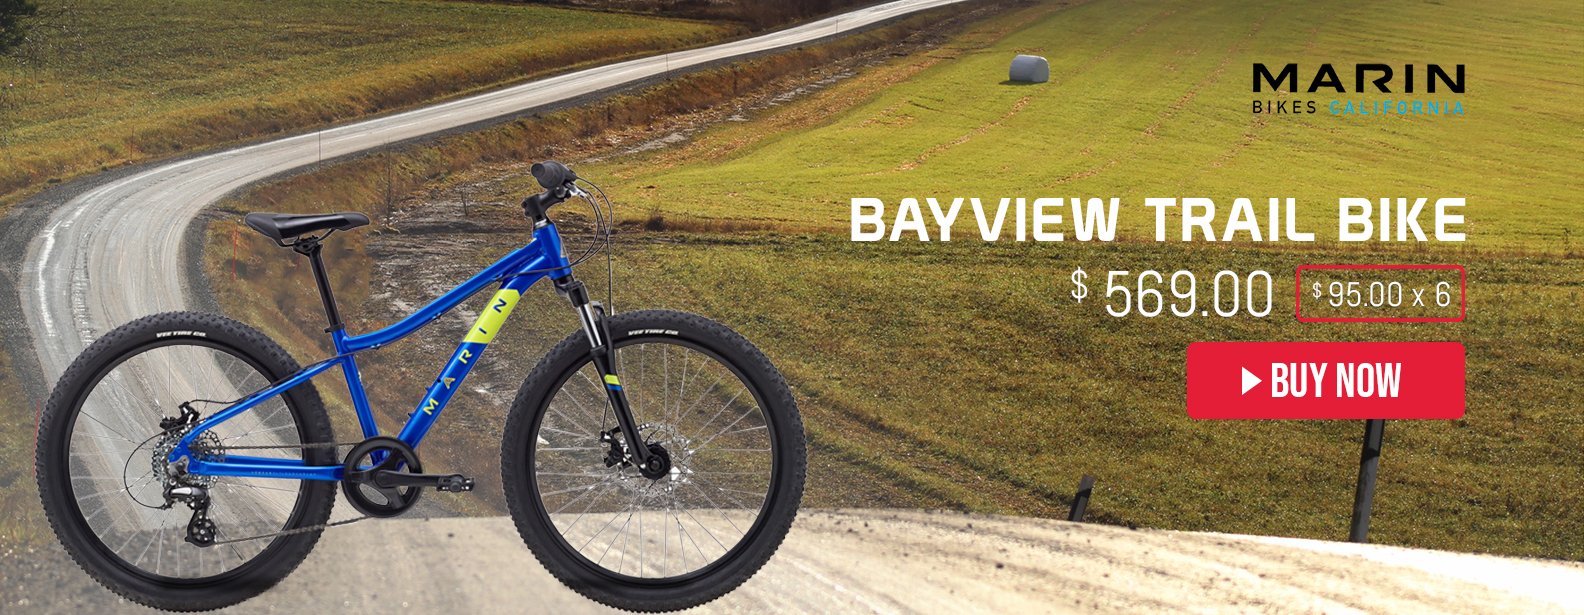 Marin Bayview Trail Bike